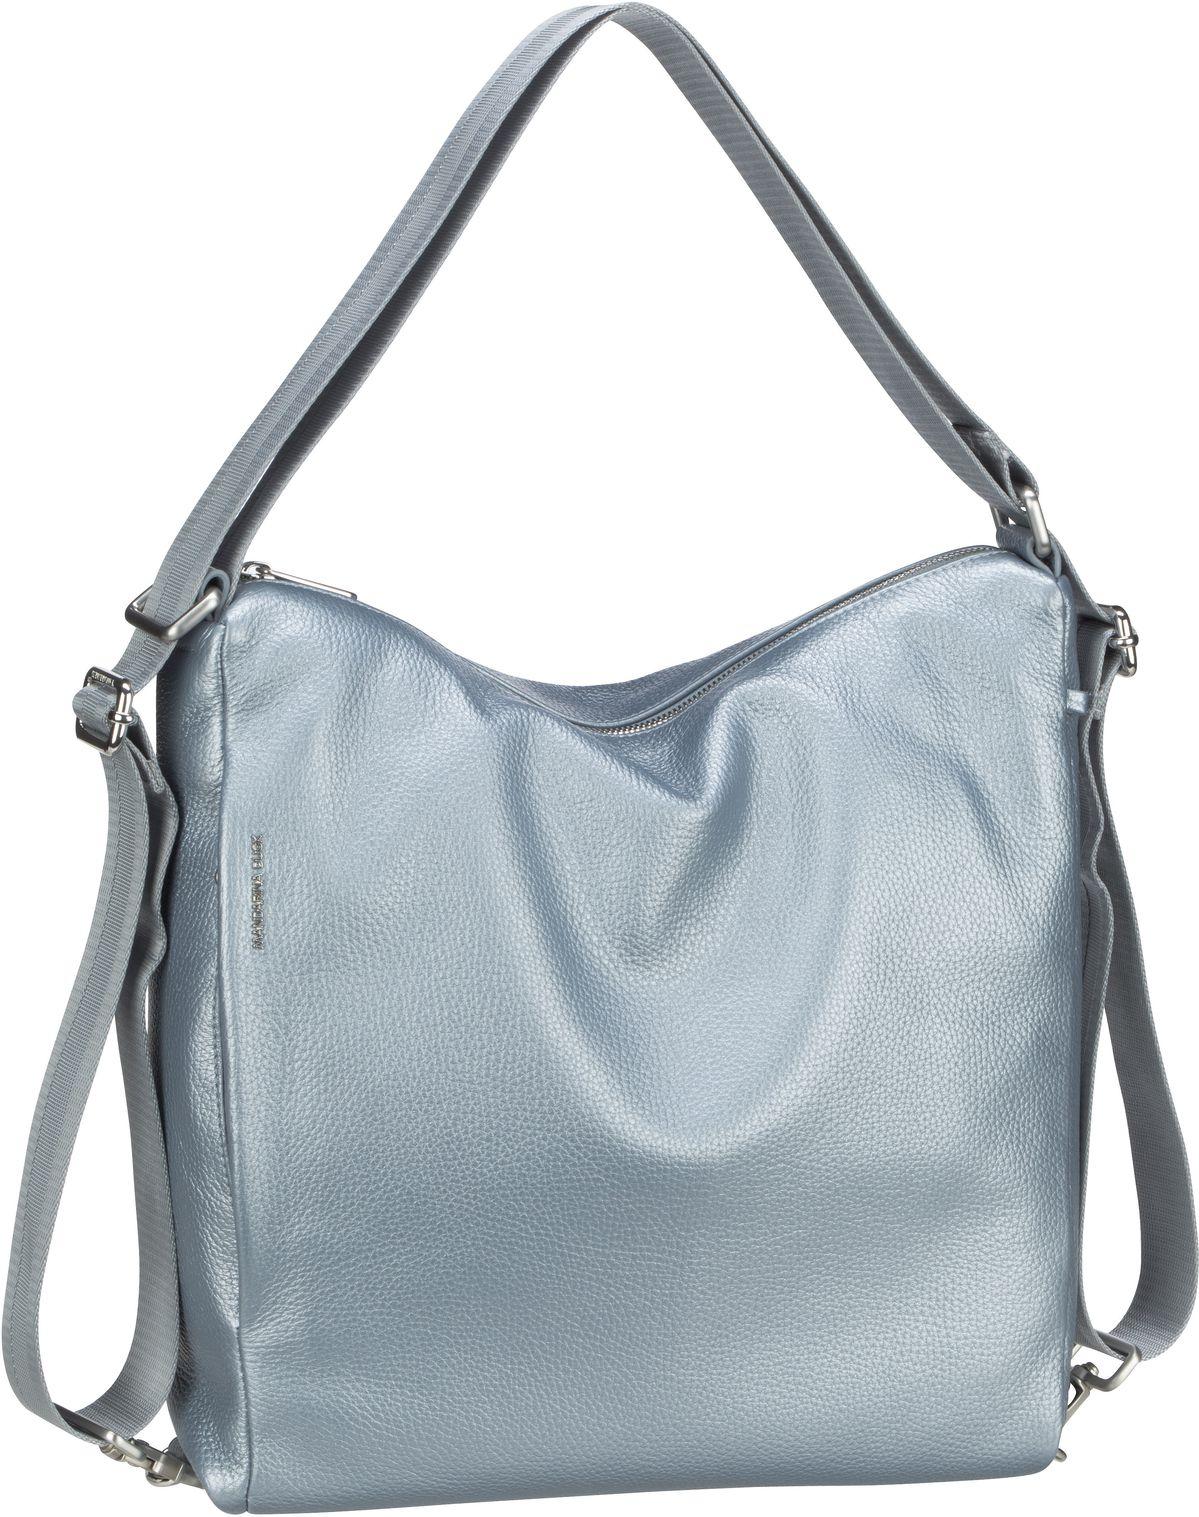 mandarina duck -  Handtasche Mellow Leather Lux Hobo ZLT72 Titanio